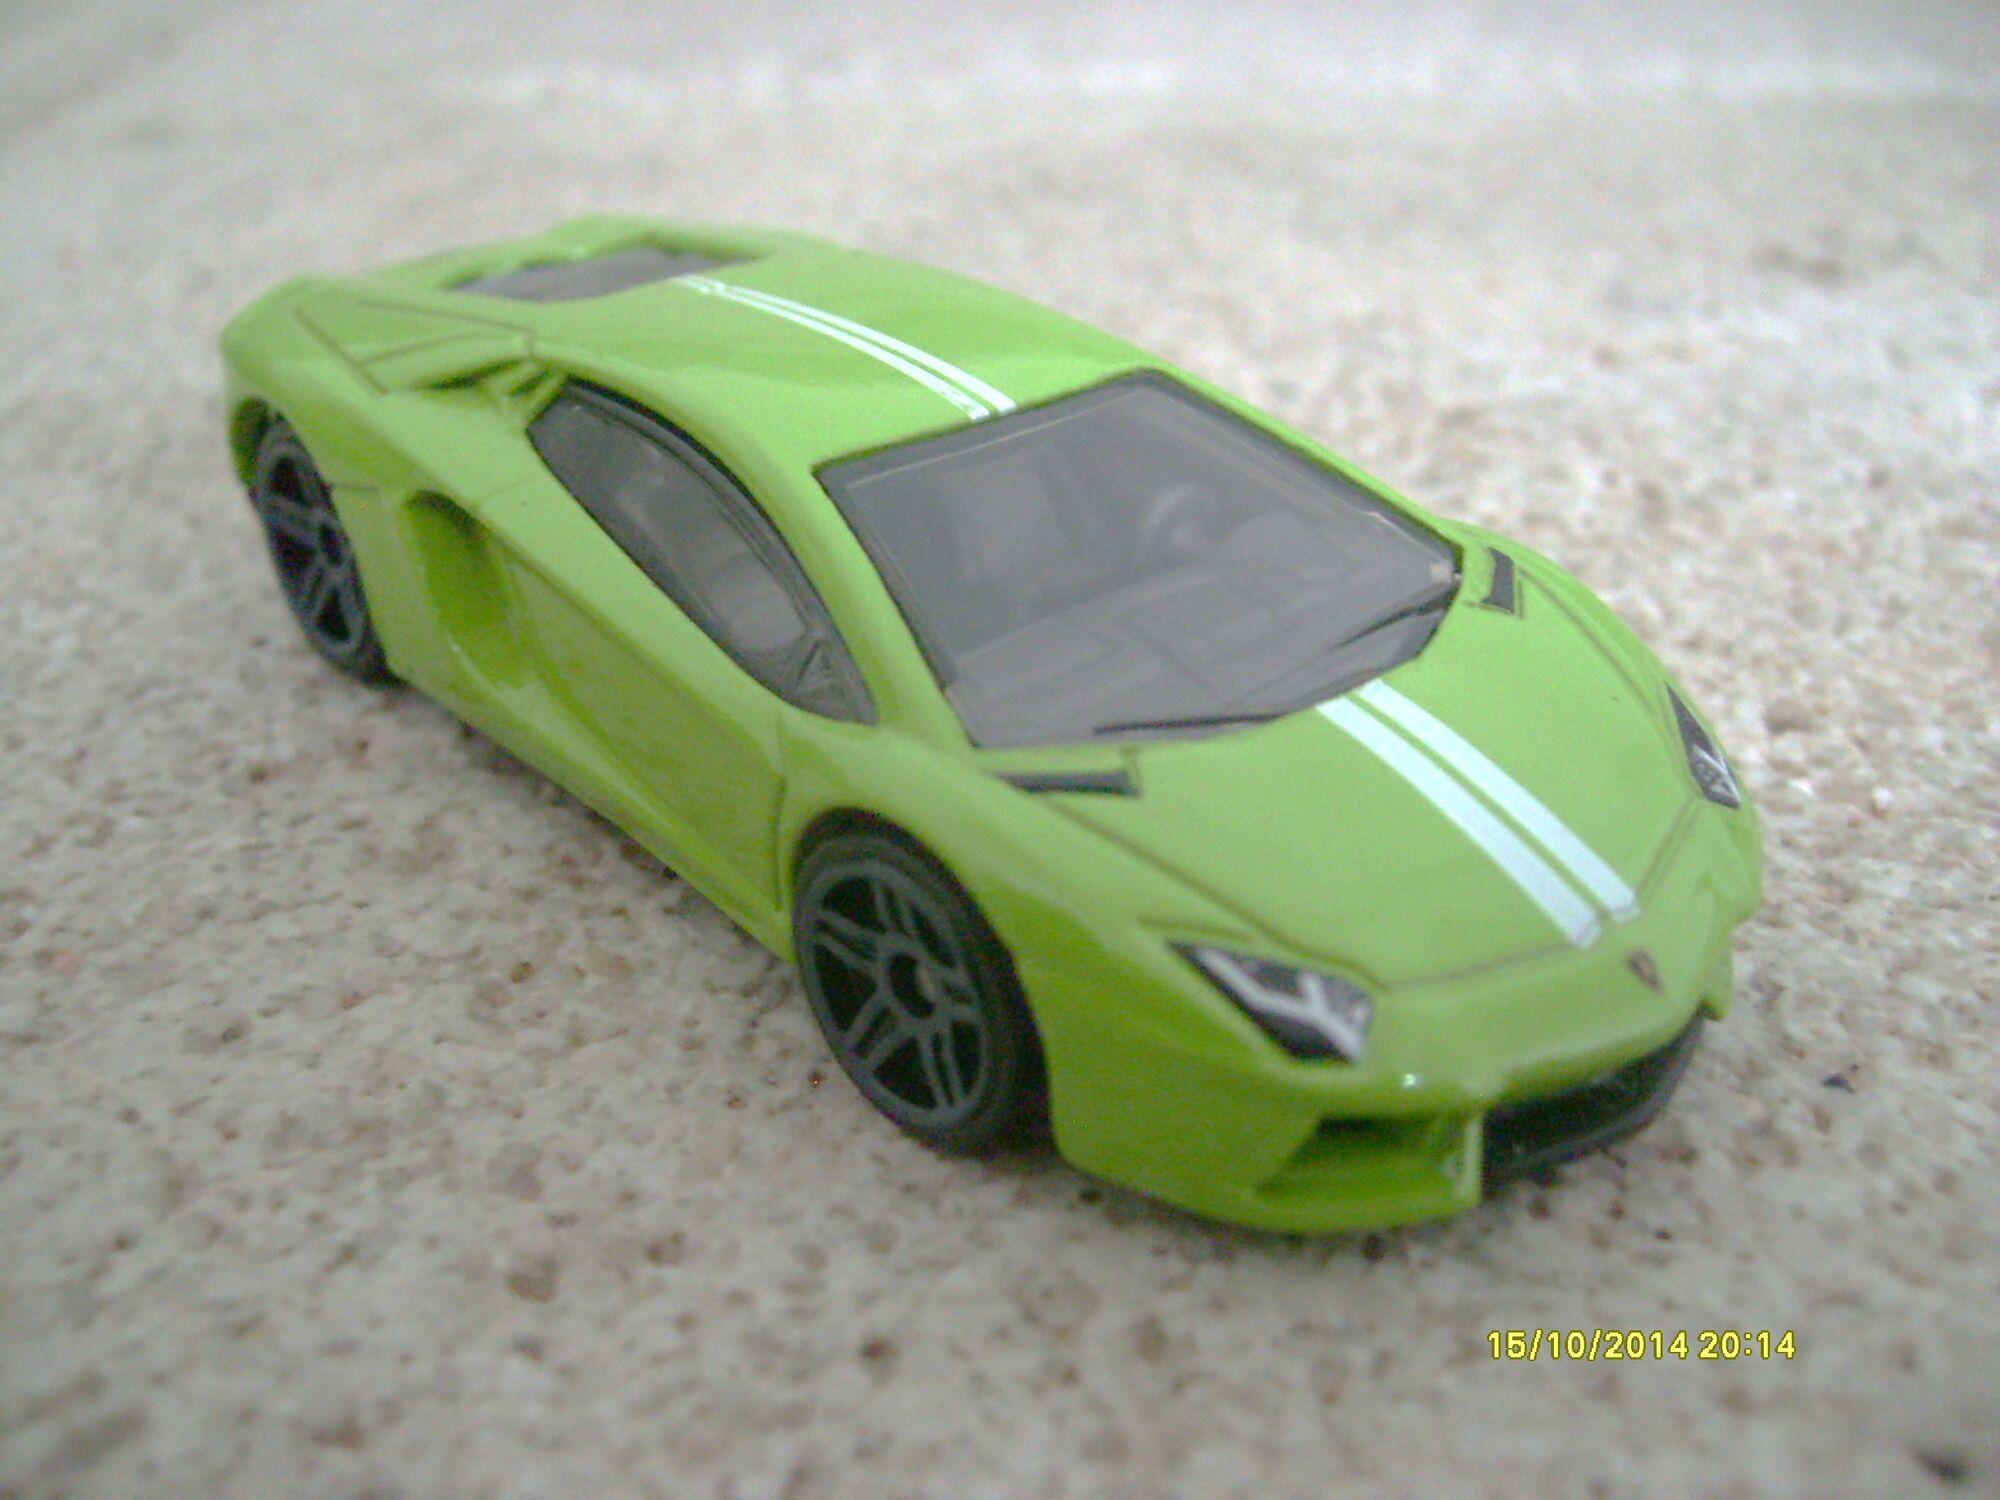 2000?cb=20141016022156 Surprising Lamborghini Gallardo Hot Wheels Wiki Cars Trend